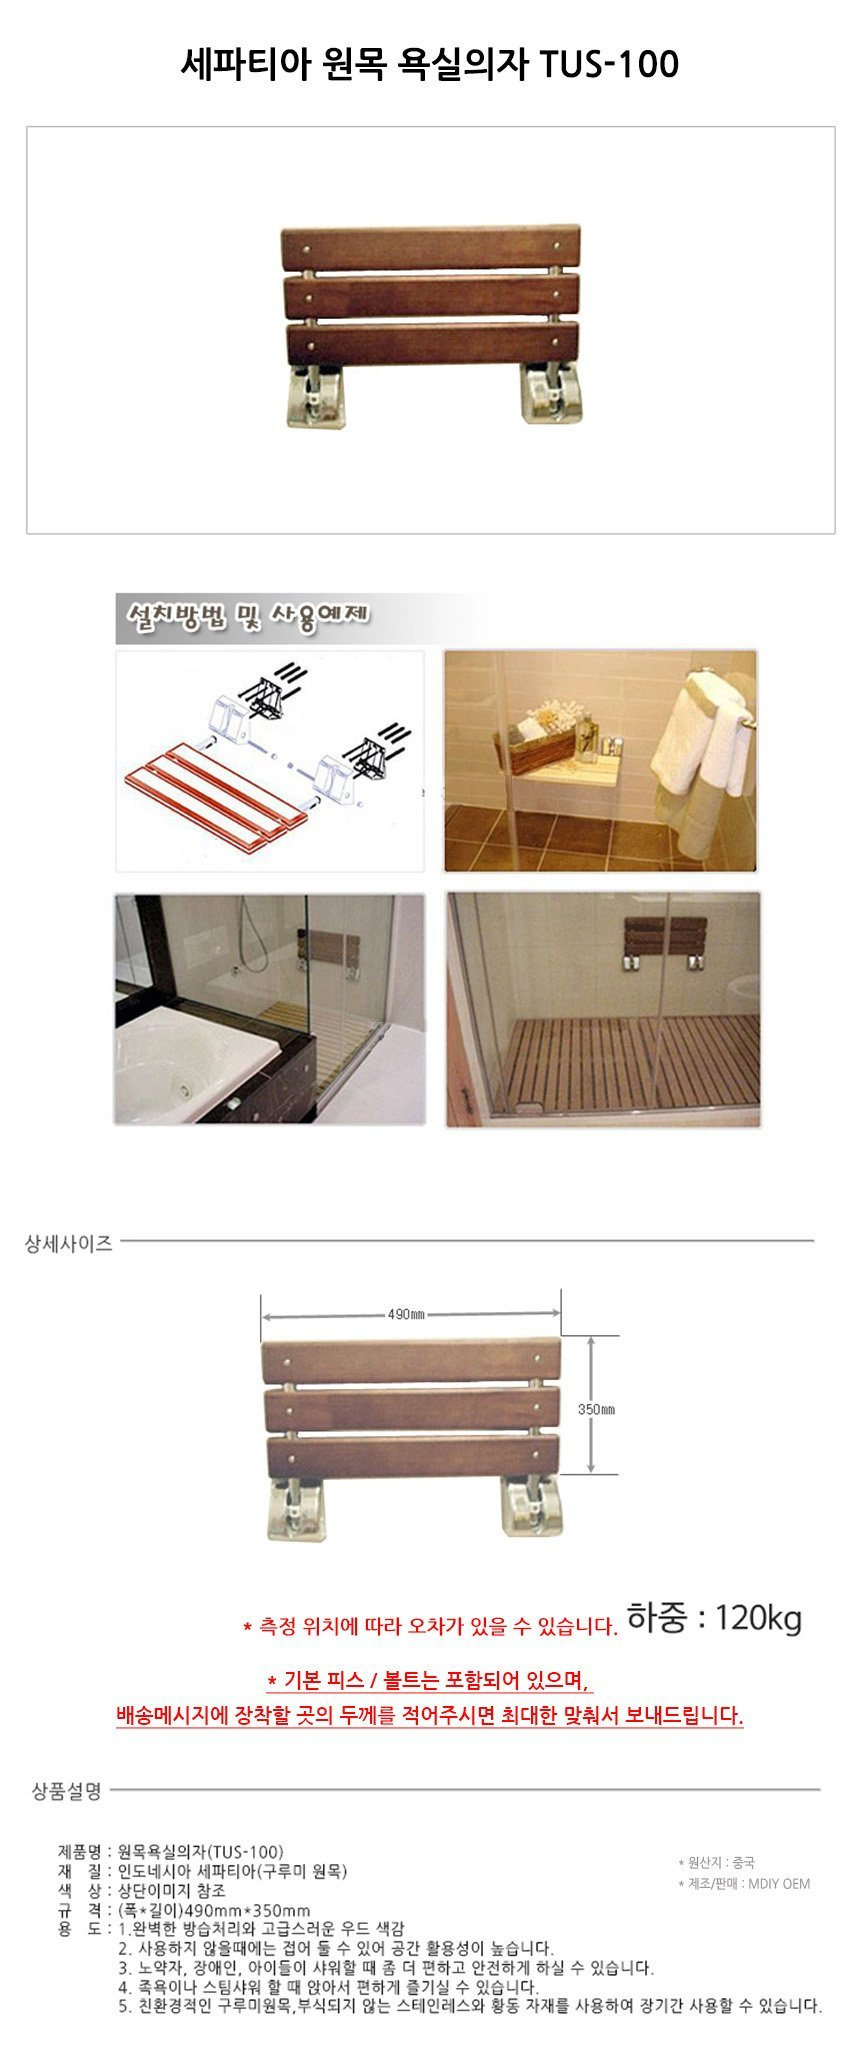 3MR_049503_detail_01.jpg